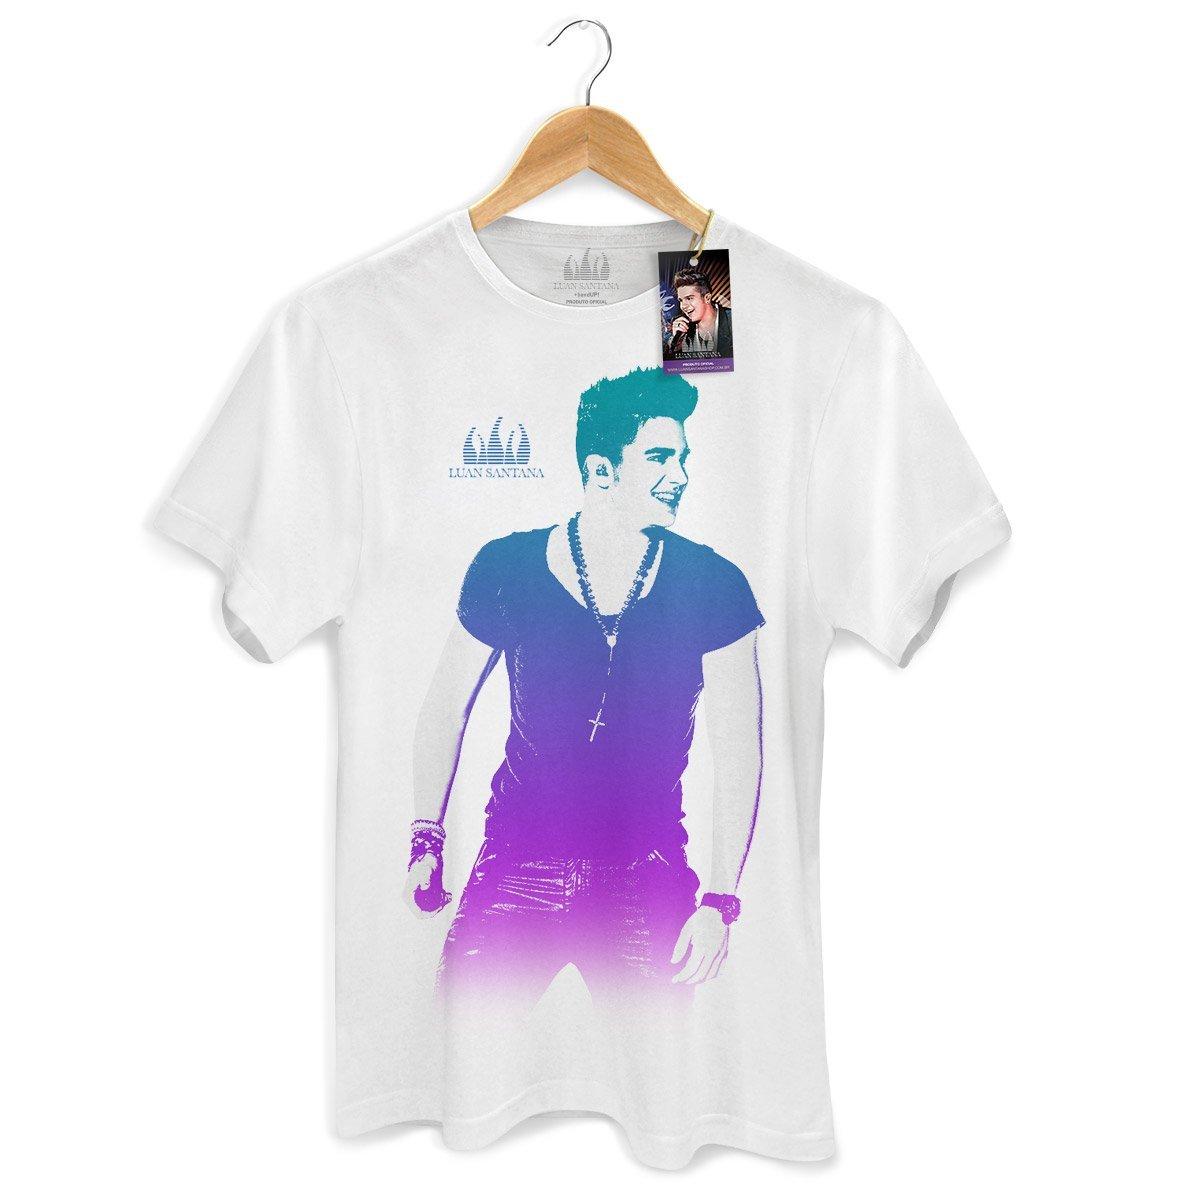 Camiseta Masculina Luan Santana Foto Degradê Branca  - bandUP Store Marketplace